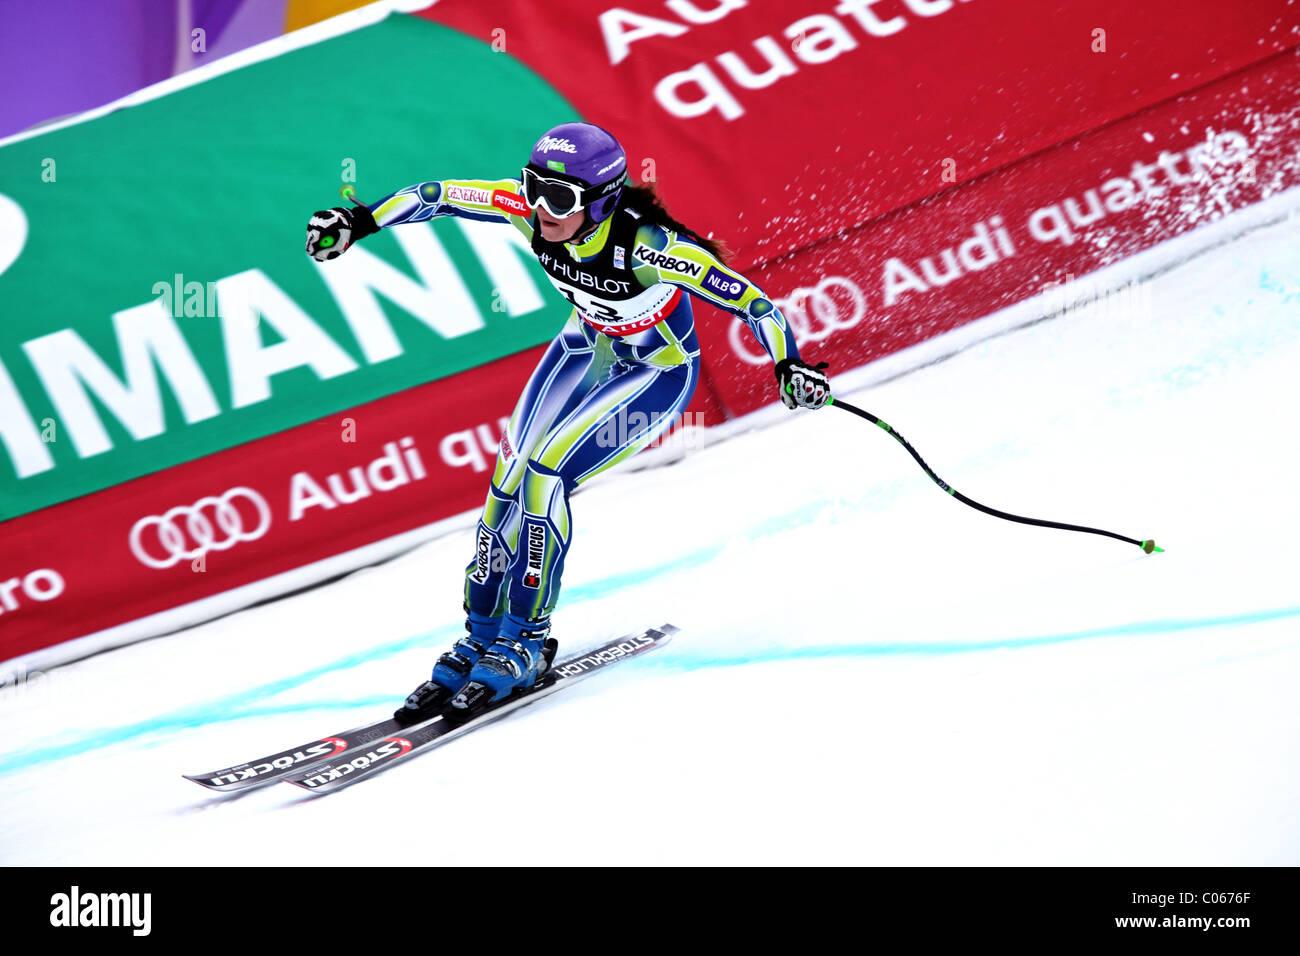 Tina Maze (SLO) at the FIS Alpine World Ski Championships 2011 in Garmisch-Partenkirchen - Stock Image